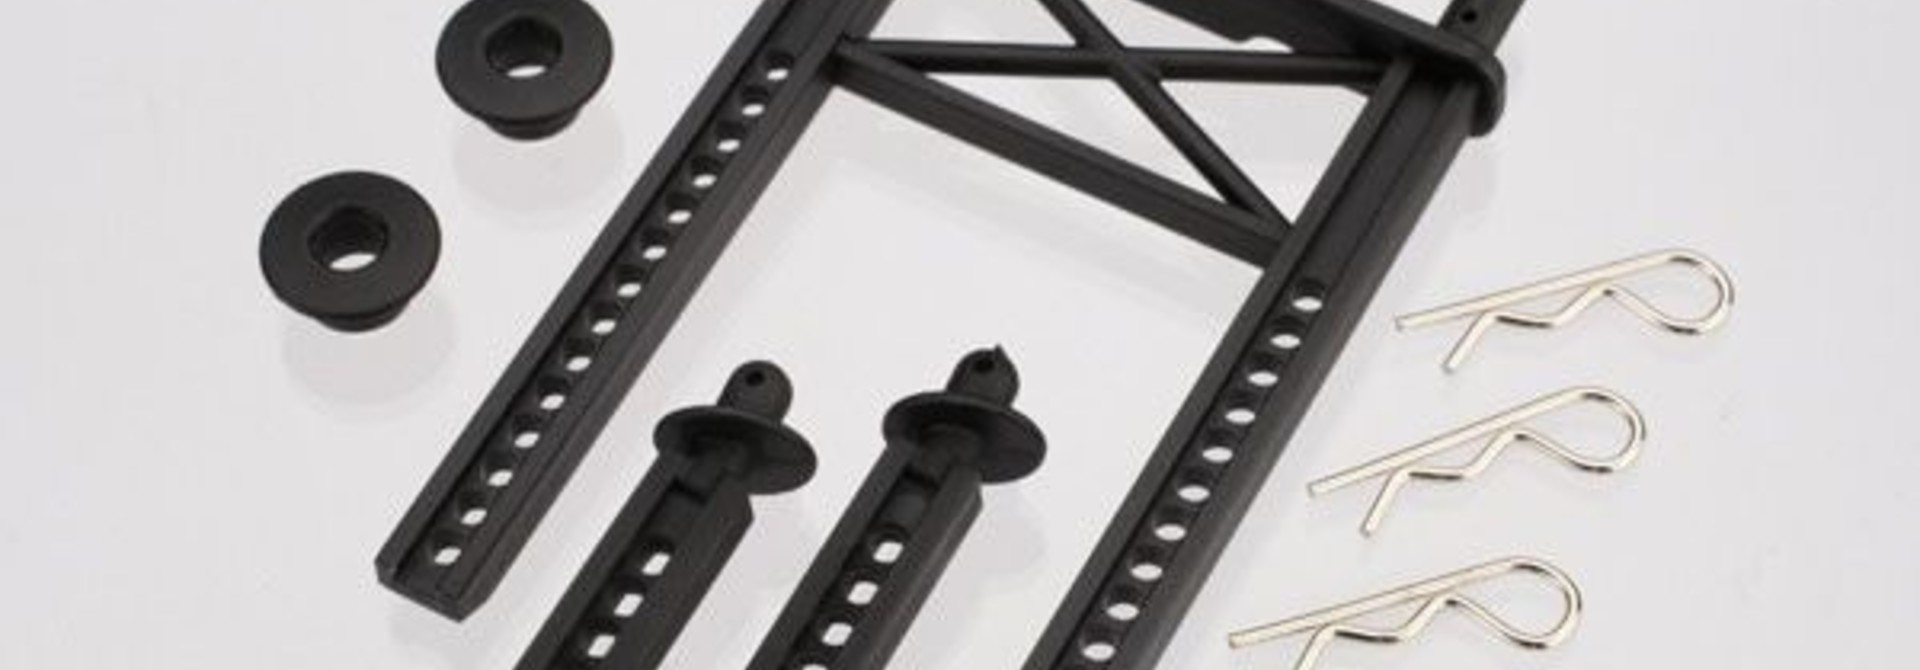 Body mount, rear/ body mount posts, front (2)/body washer, r, TRX7315